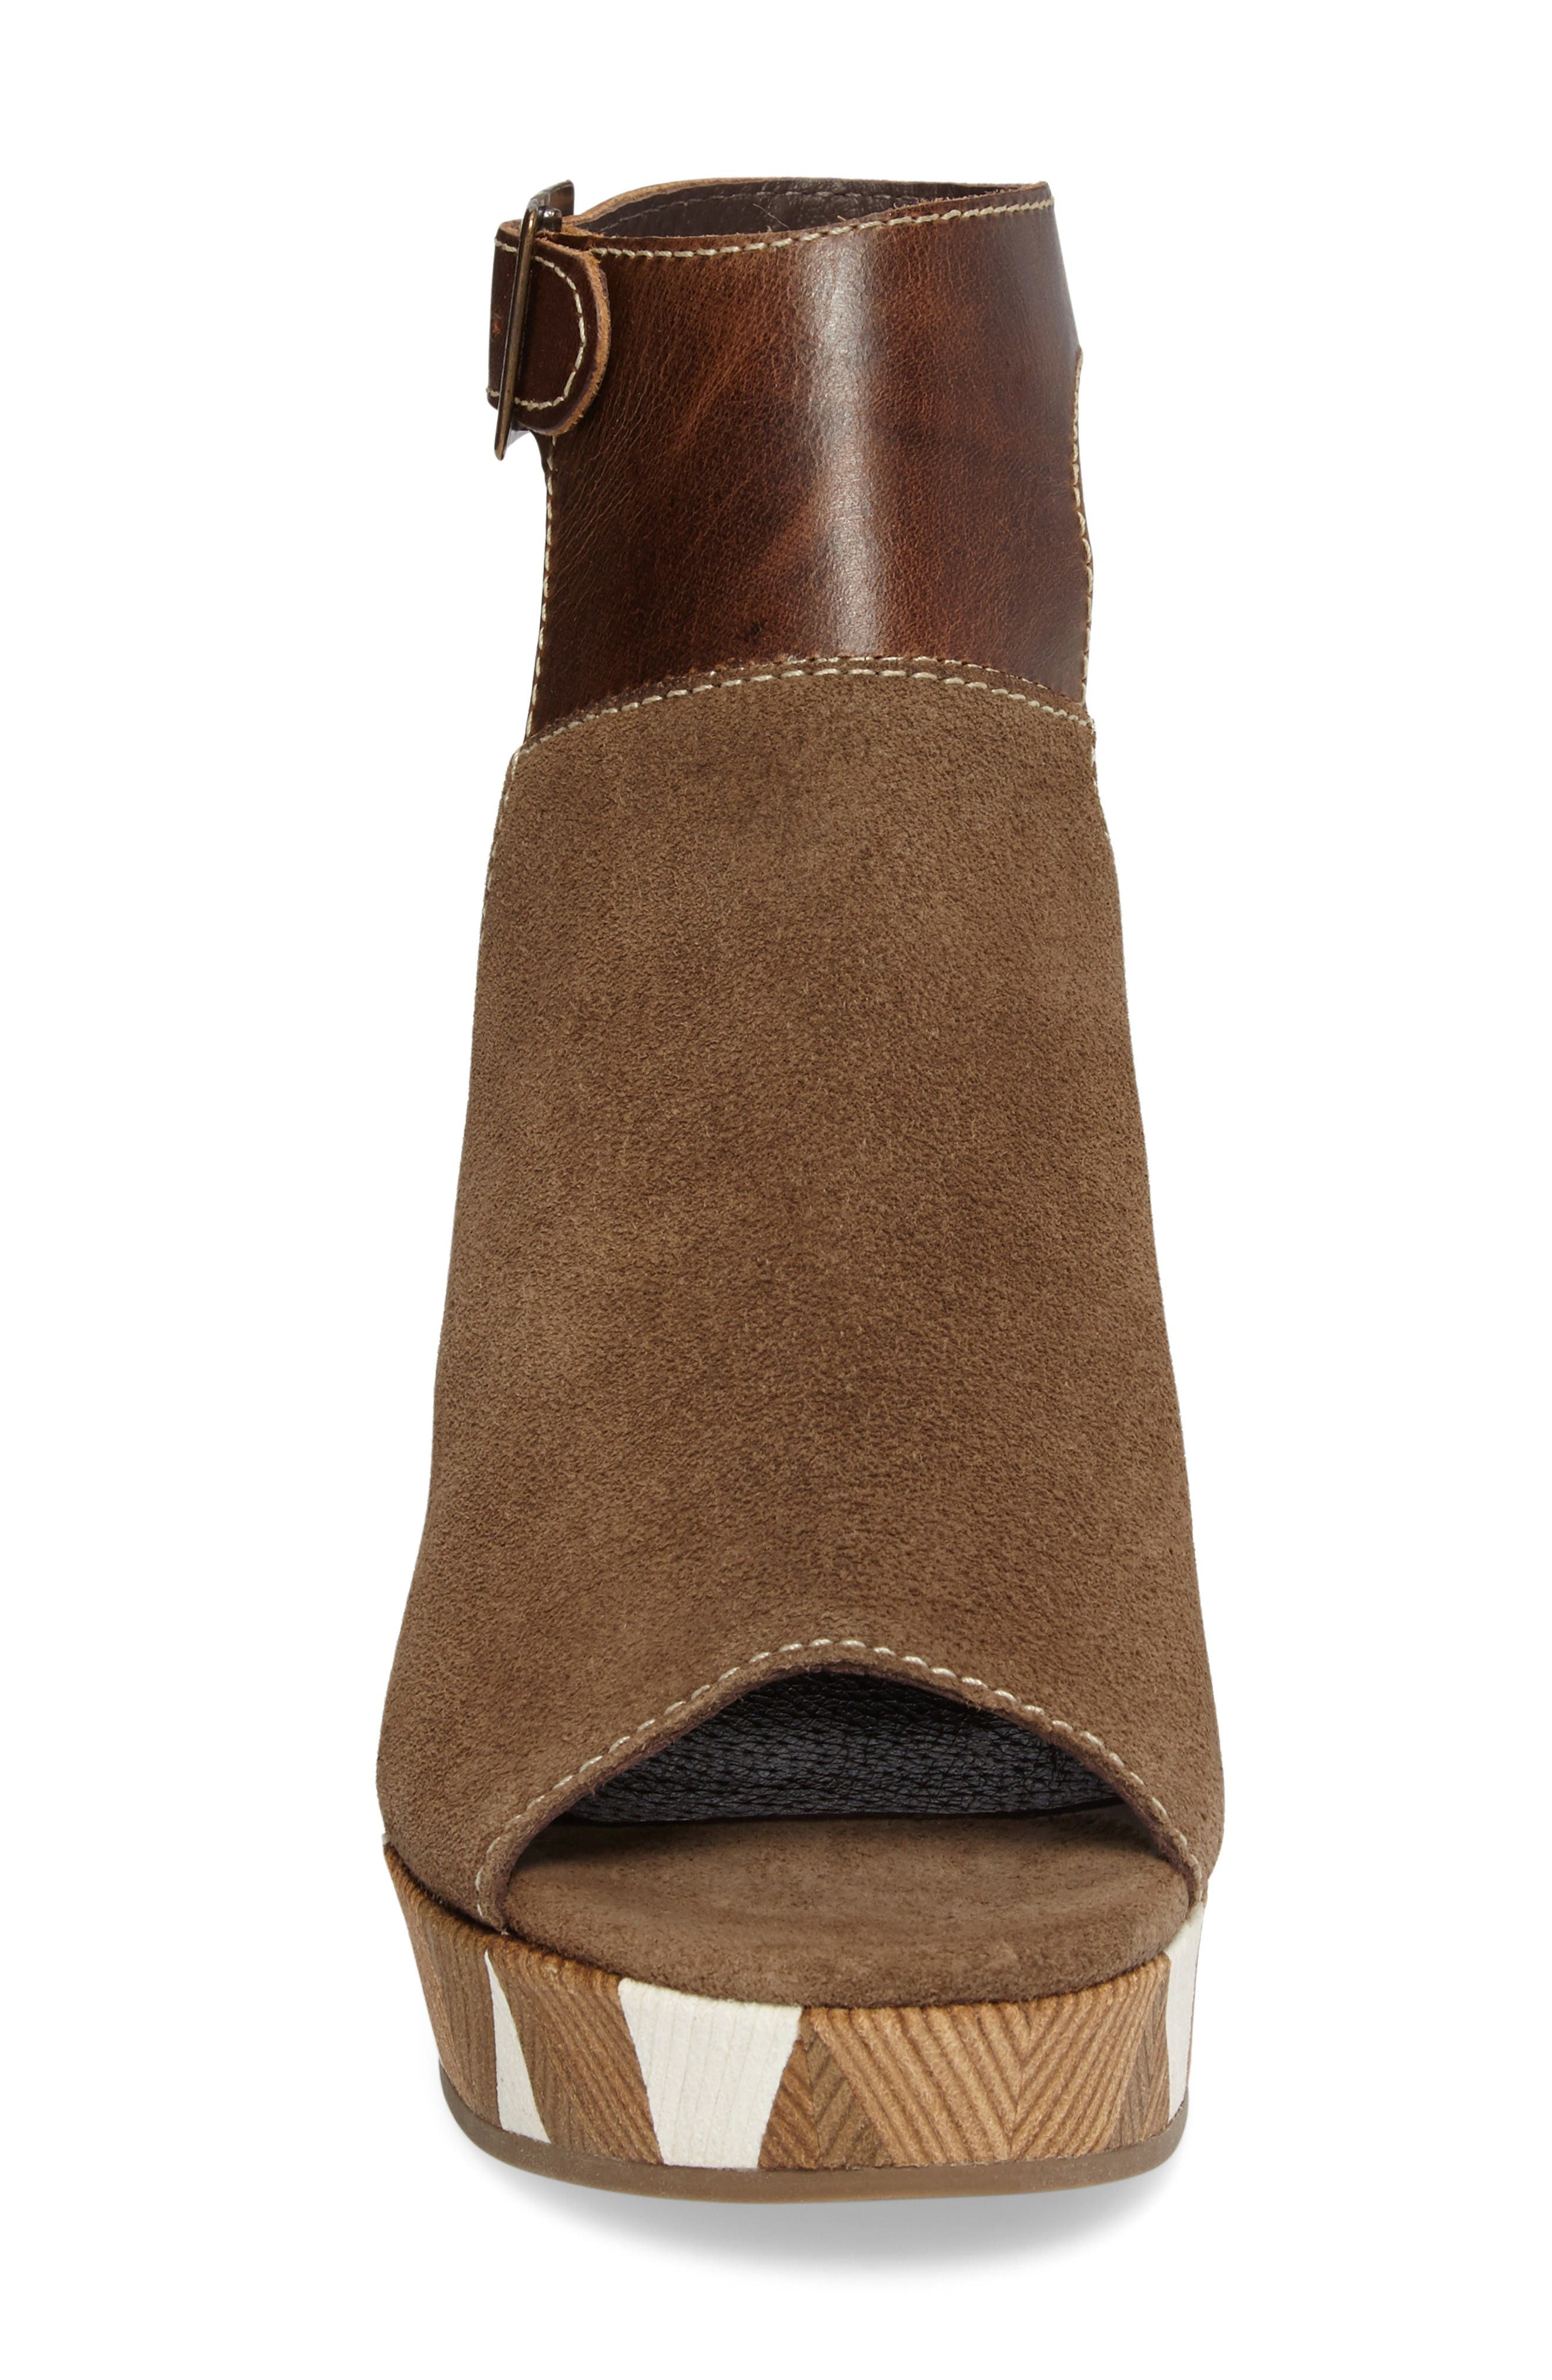 Alternate Image 3  - Matisse Harlequin Wedge Sandal (Women)